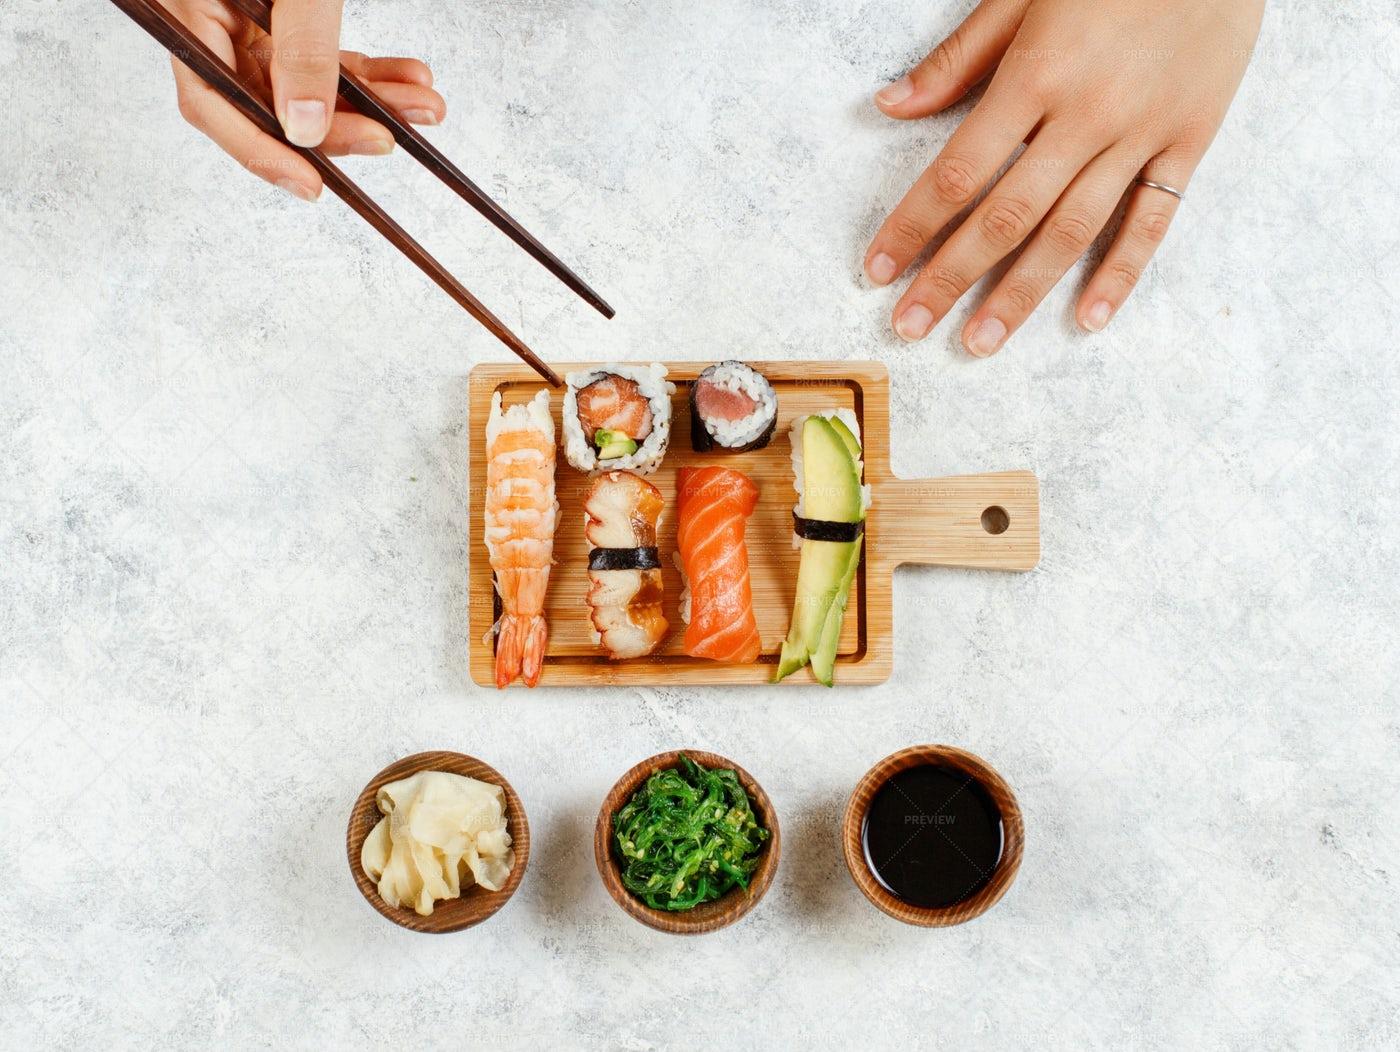 Eating Sushi Rolls: Stock Photos